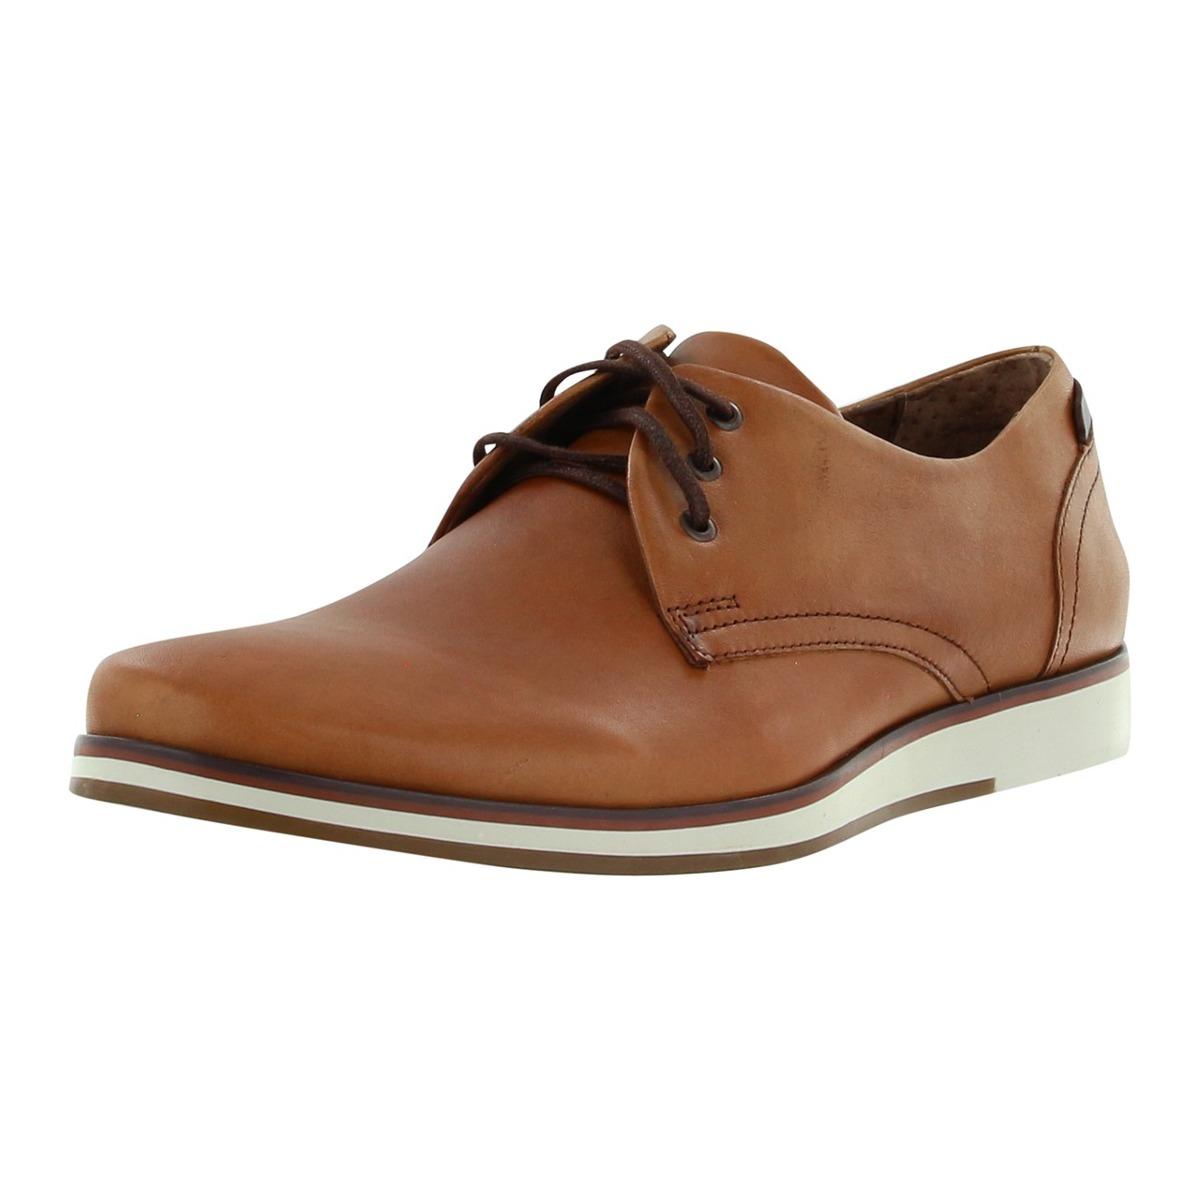 Tan Caballero Hombre Gaynor Zapato Dorothy Moderno Derby Qzfgnotwx w4XxF6xq